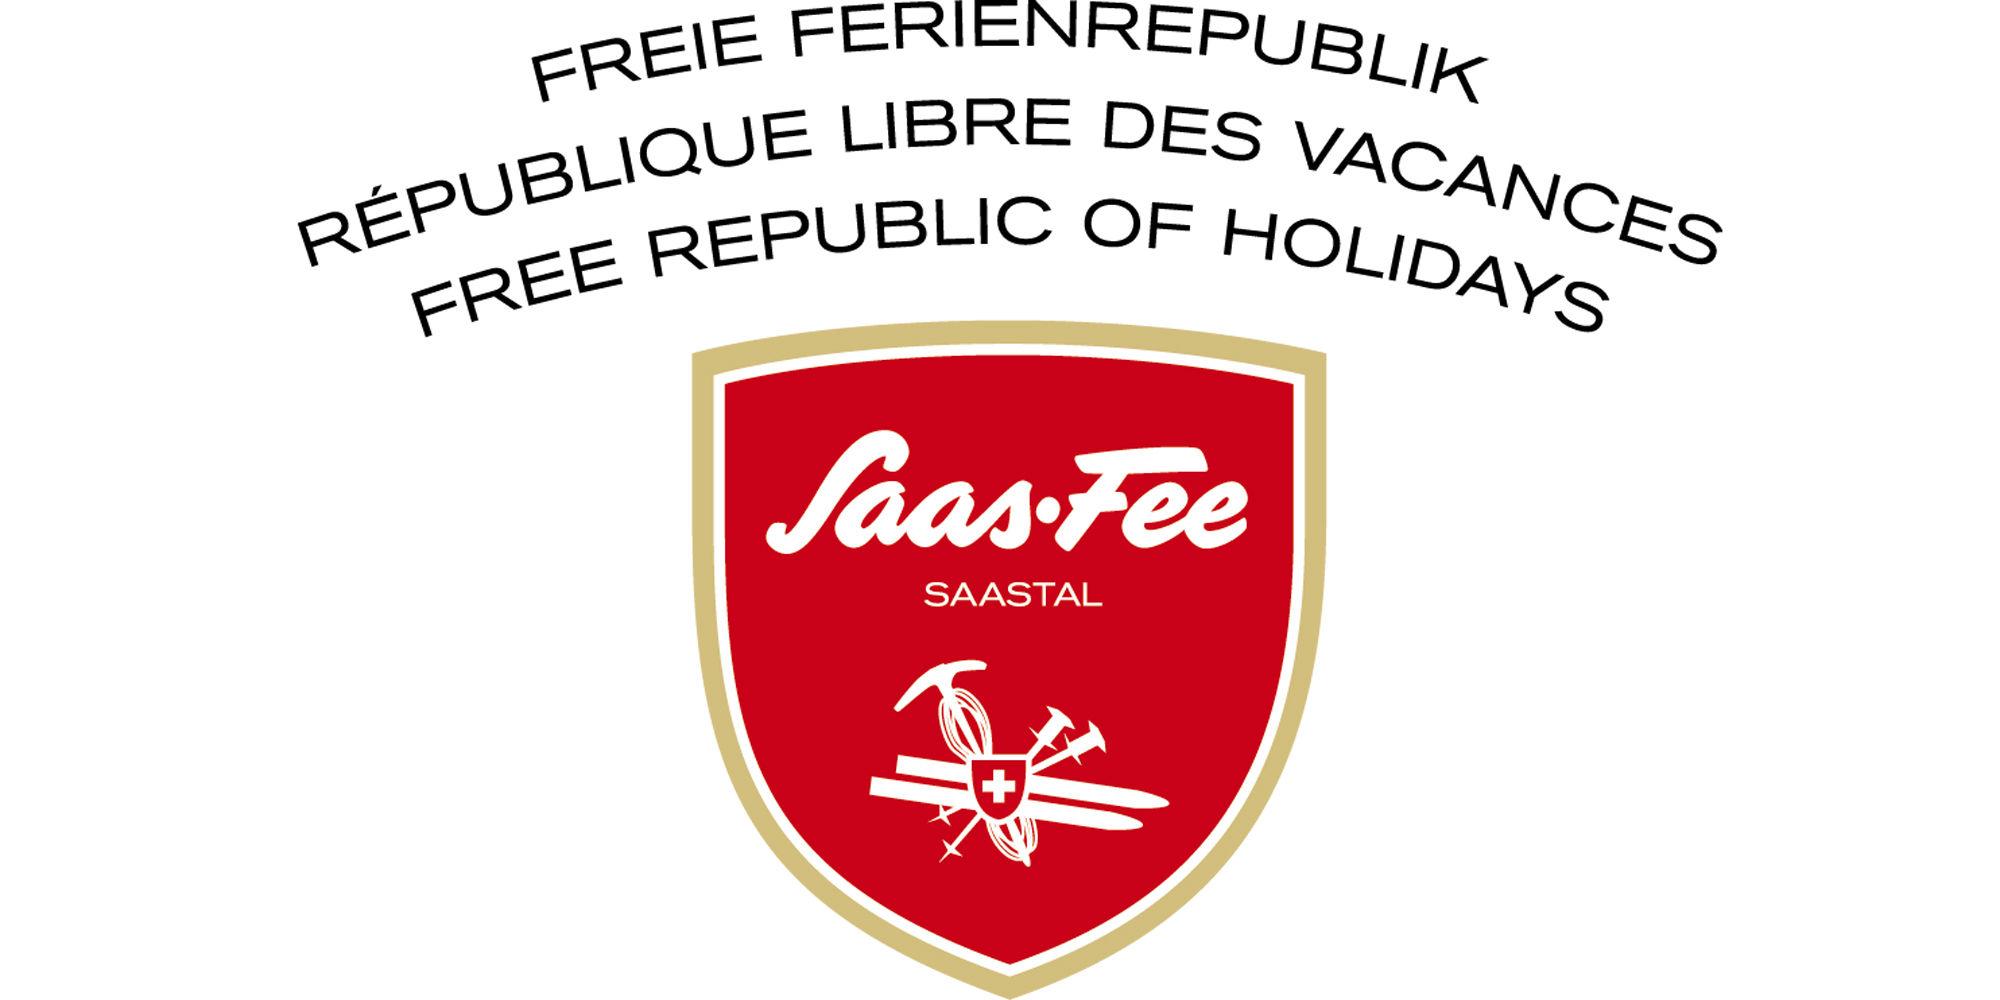 Logo Freie Ferienrepublik Saas-Fee